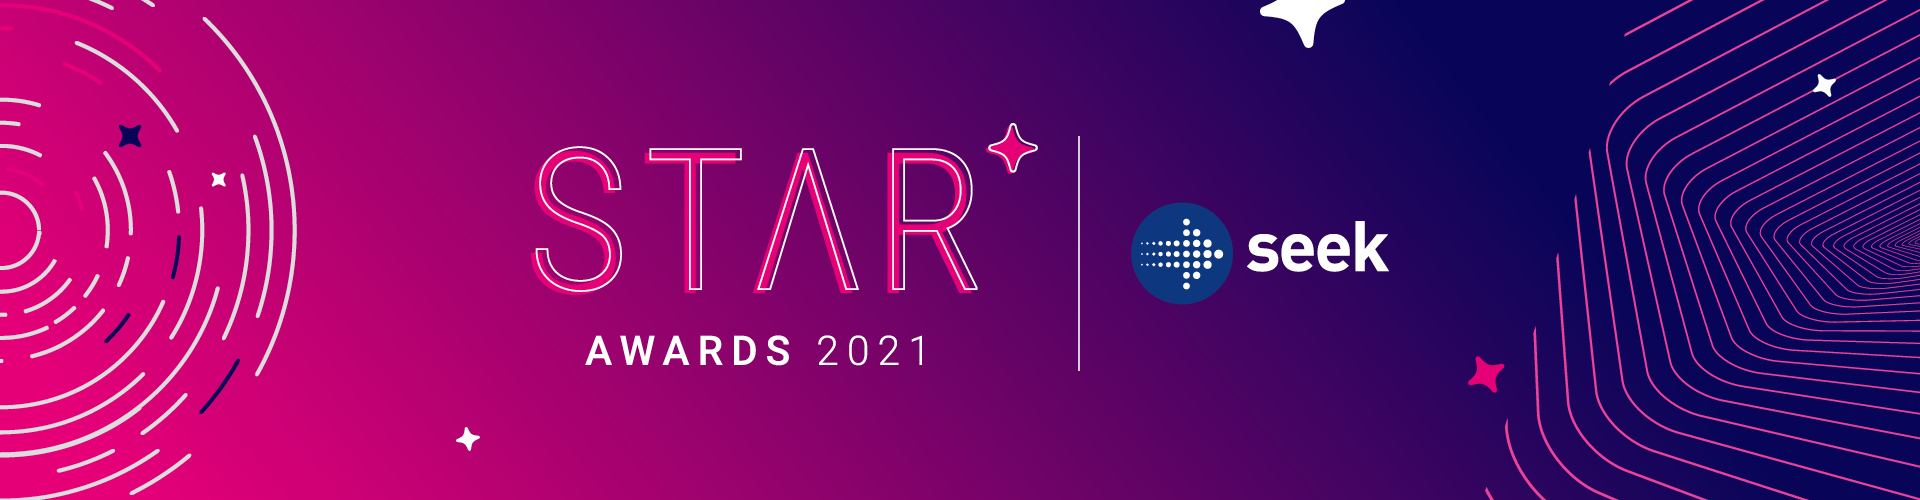 STAR Awards image